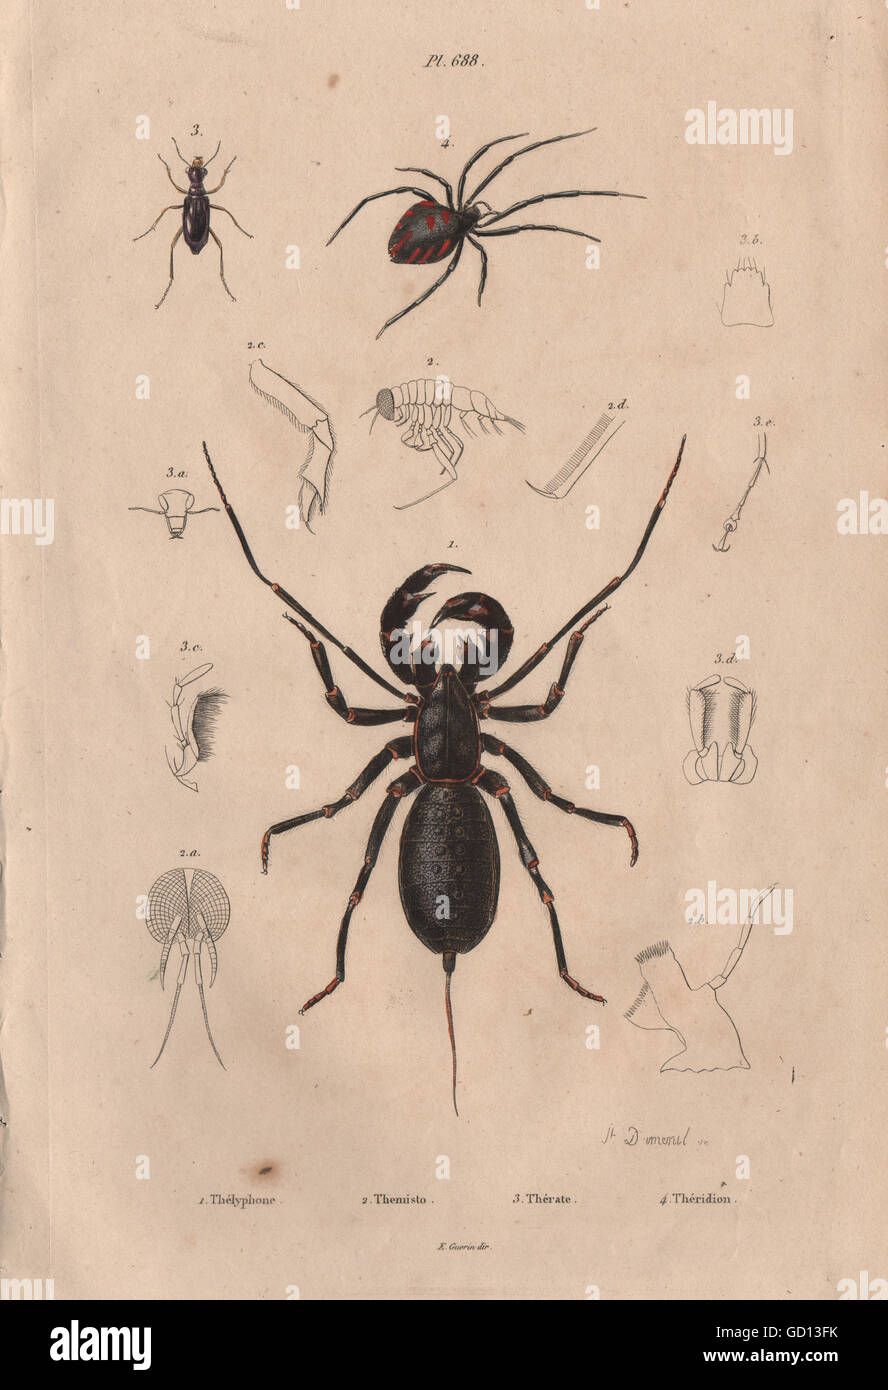 SPIDERS: Thelyphonida (Vinegaroon). Theridion (Black Widow Spider).Theratus 1833 - Stock Image